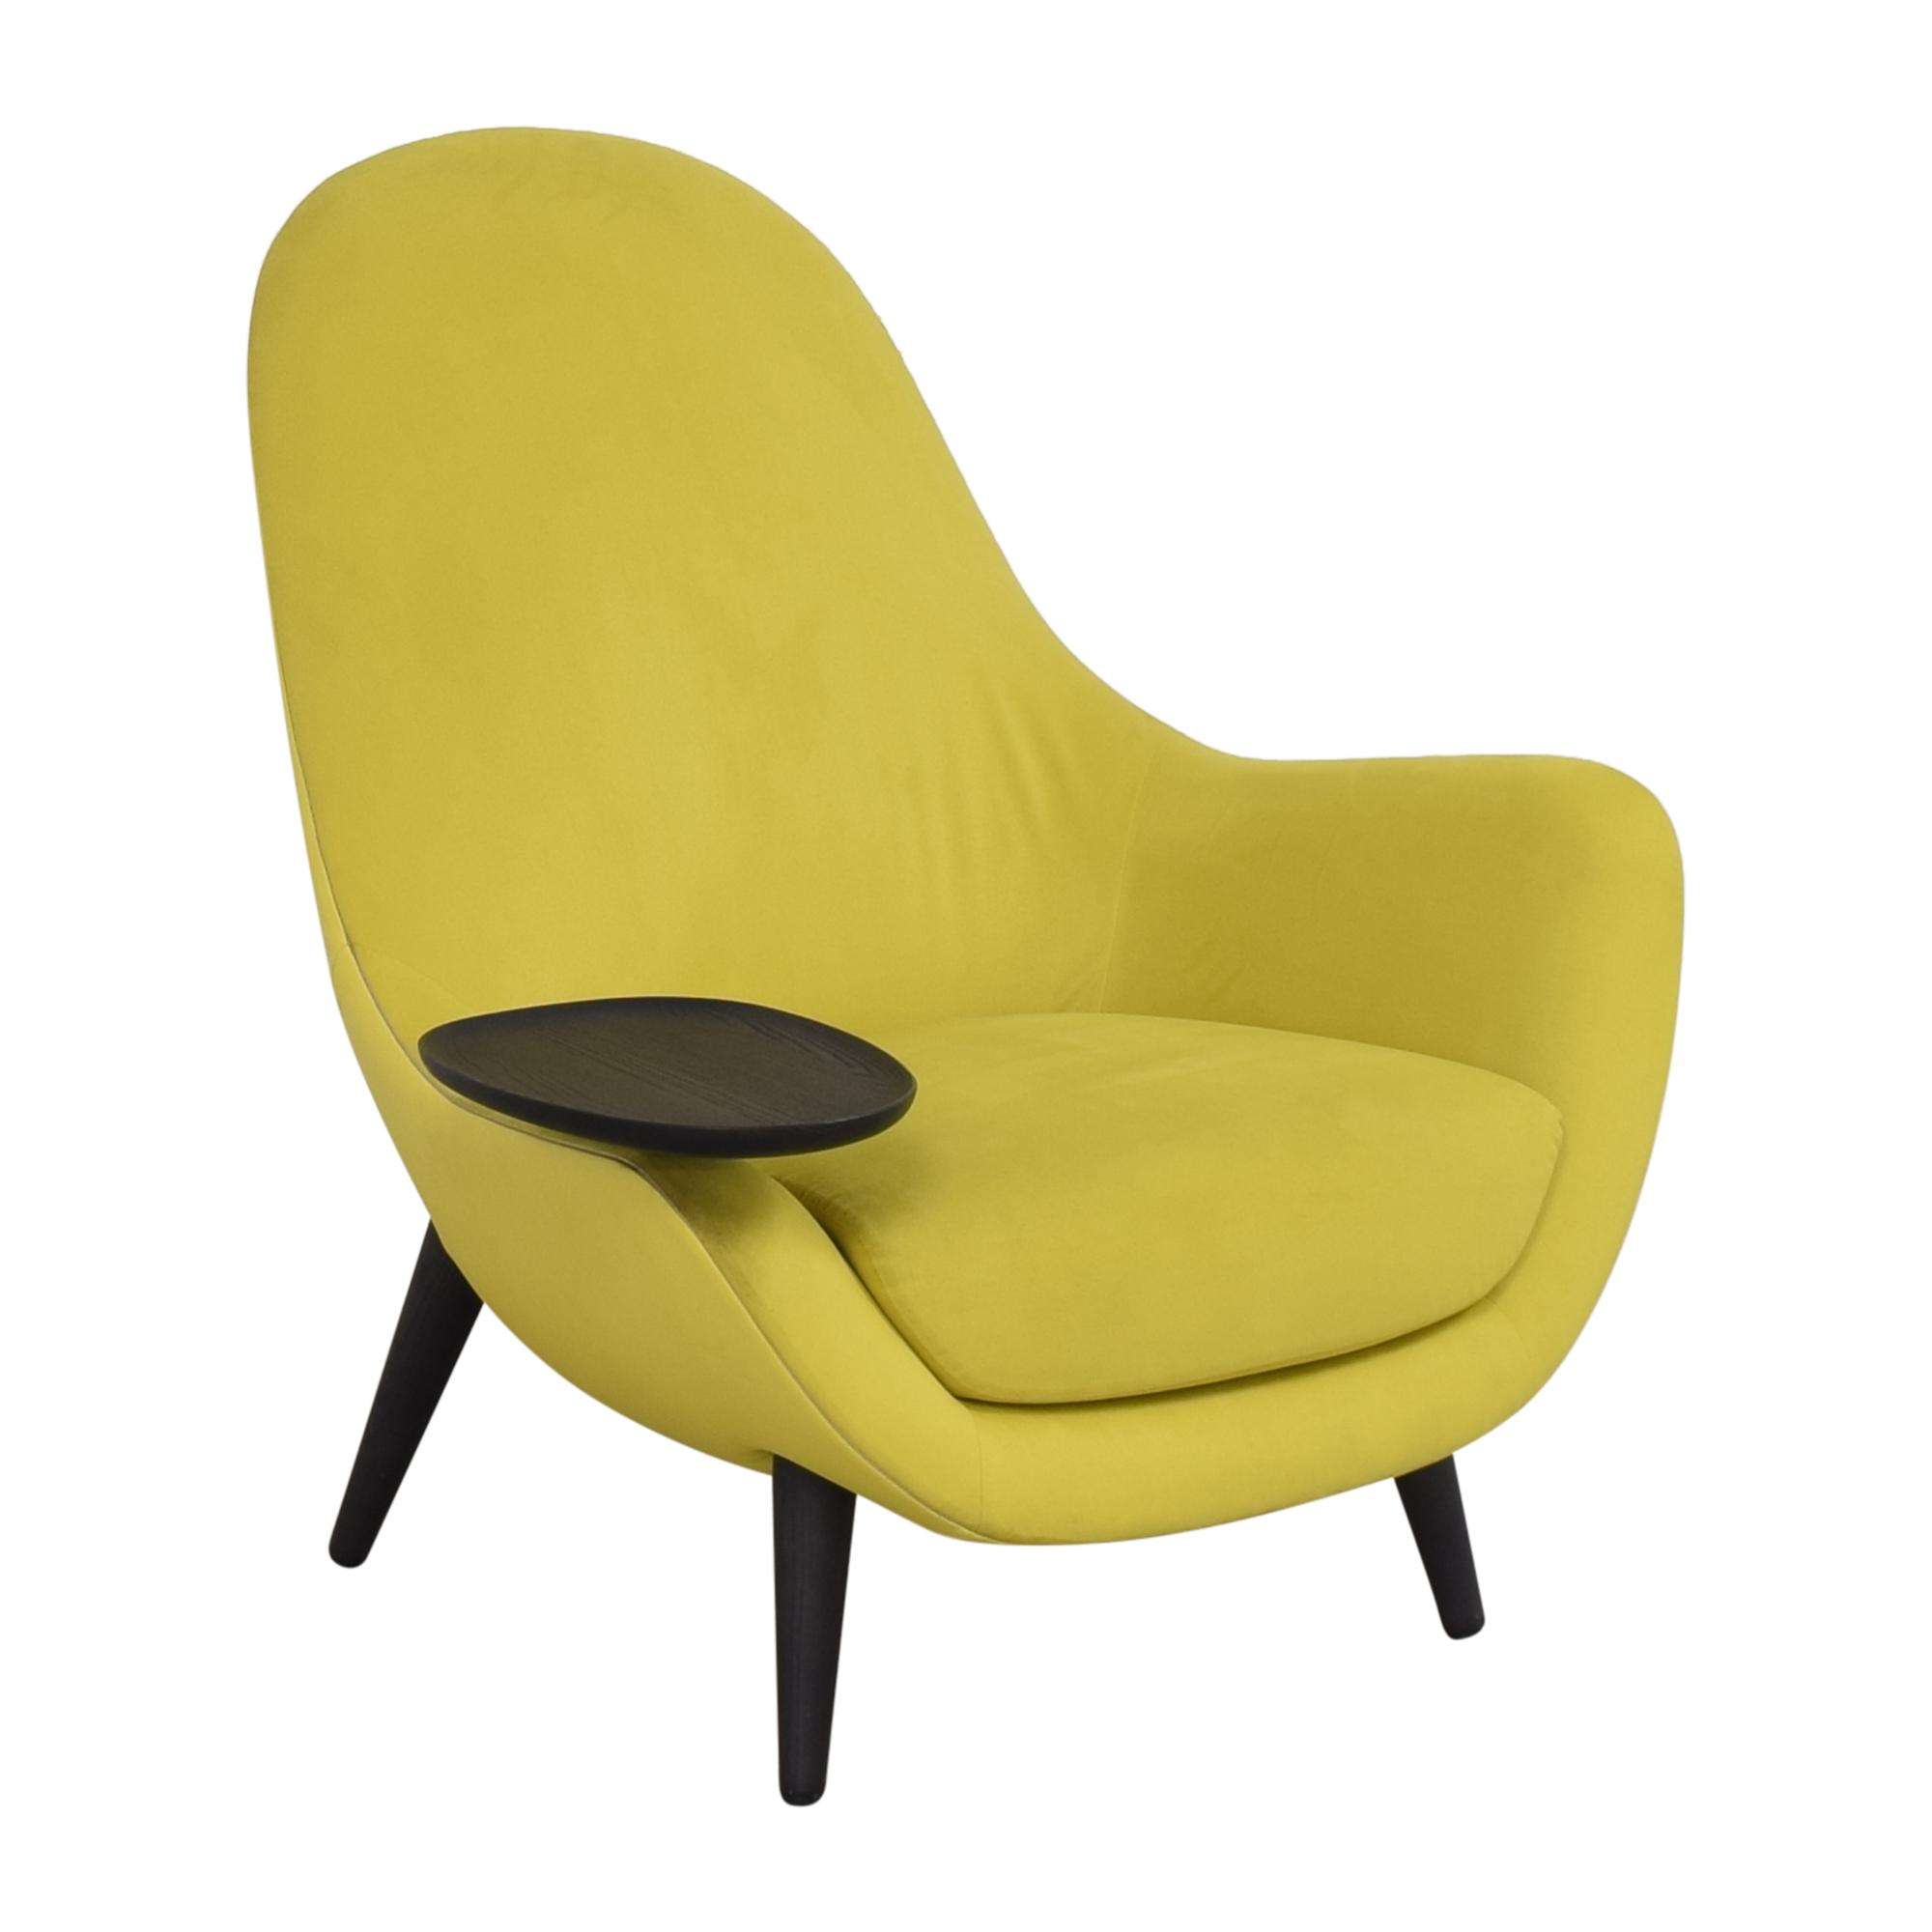 Poliform Poliform Mad King Chair yellow and black